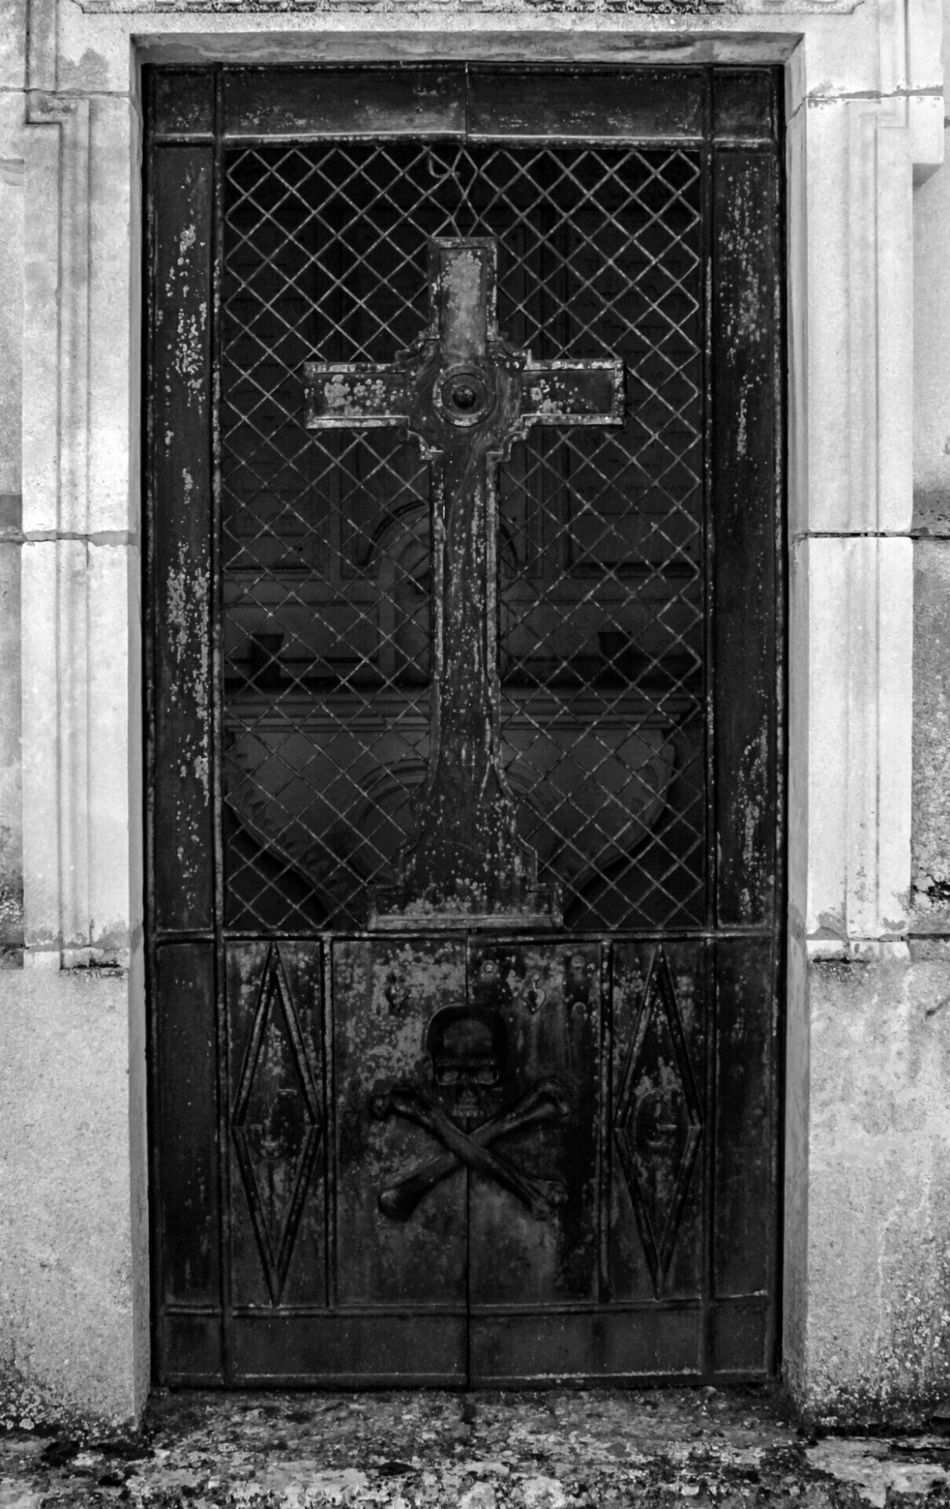 Cemetery_shots Cemetery Series Cemeterybeauty Cemetery_lovers Paz Cementerios  Cementeriosdeespaña Cementerio Puertas Puertas Y Ventanas